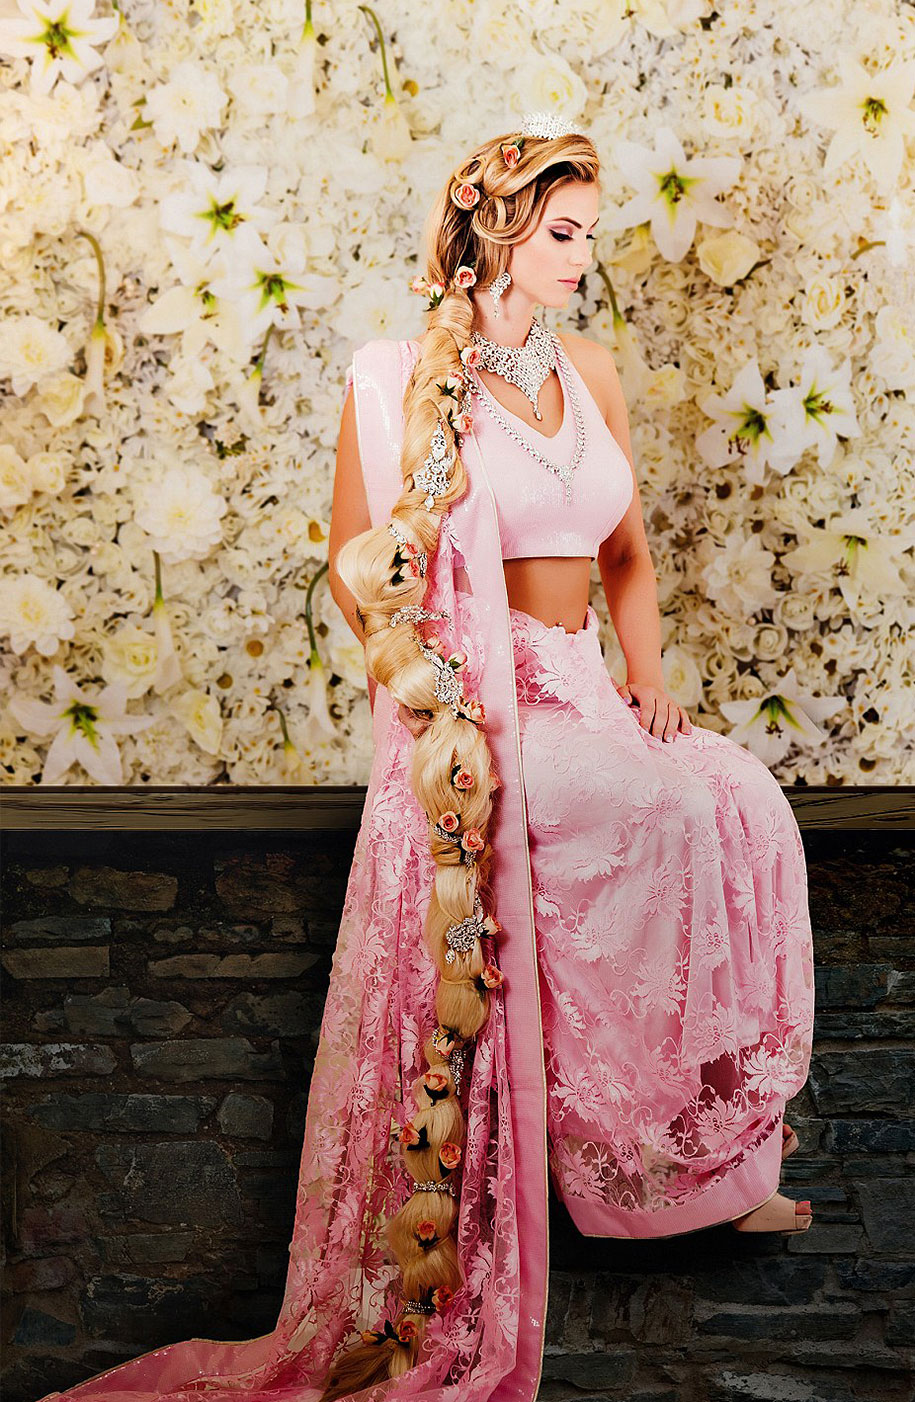 disney-princess-bride-india-wedding-photography-amrit-grewal-3